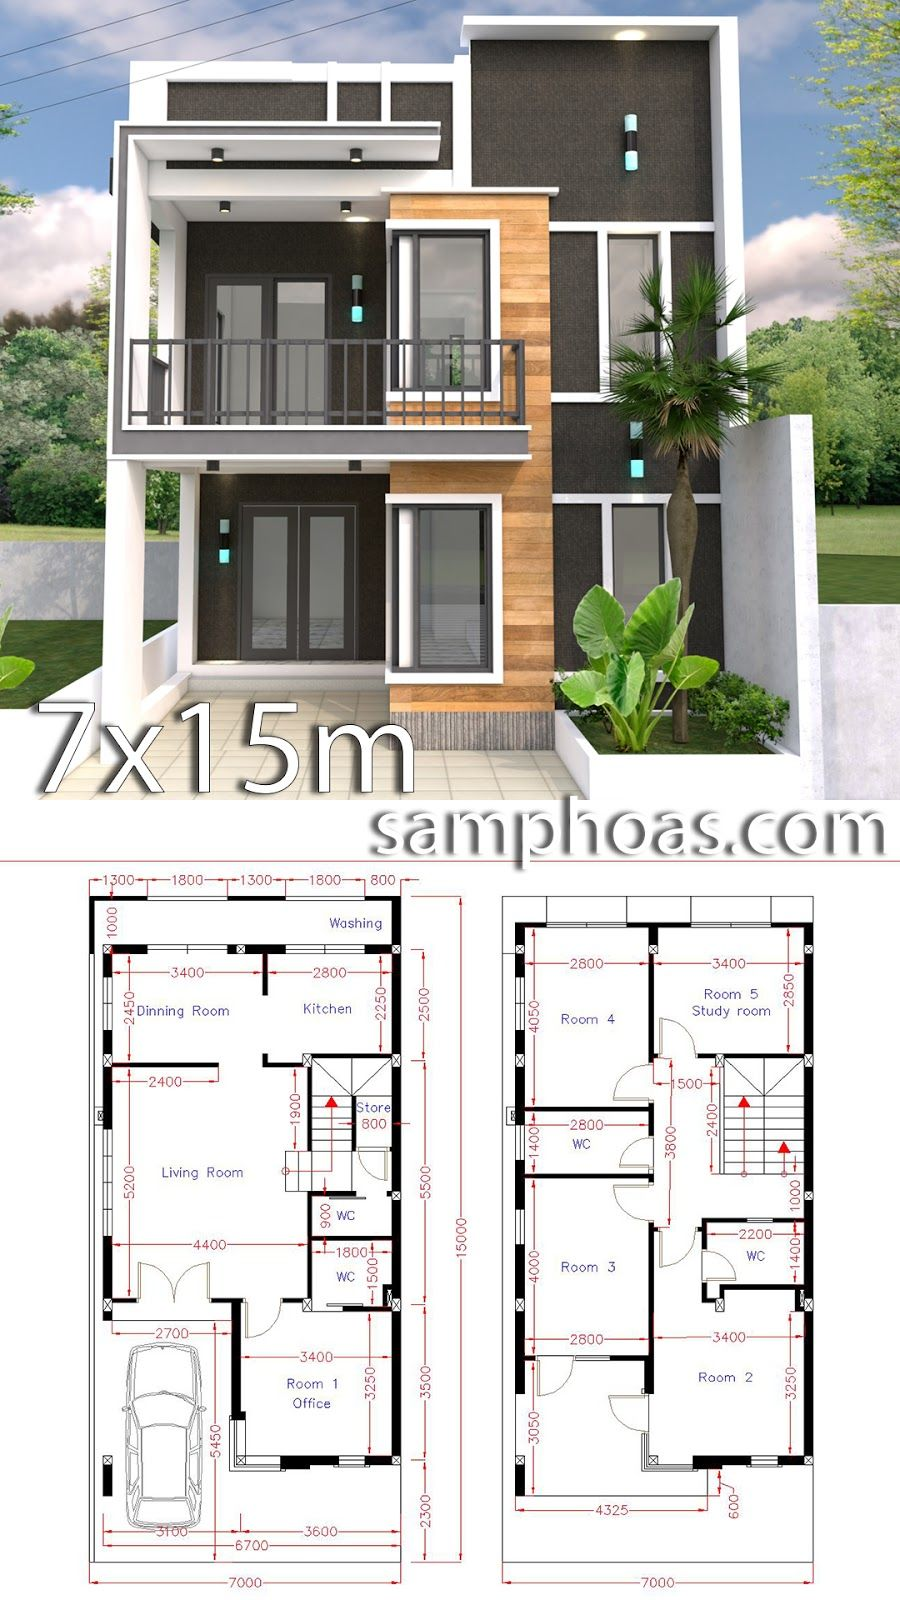 Pin By Altaf Choudari On Goals By Jb Home Design Plan Duplex House Design House Layout Plans